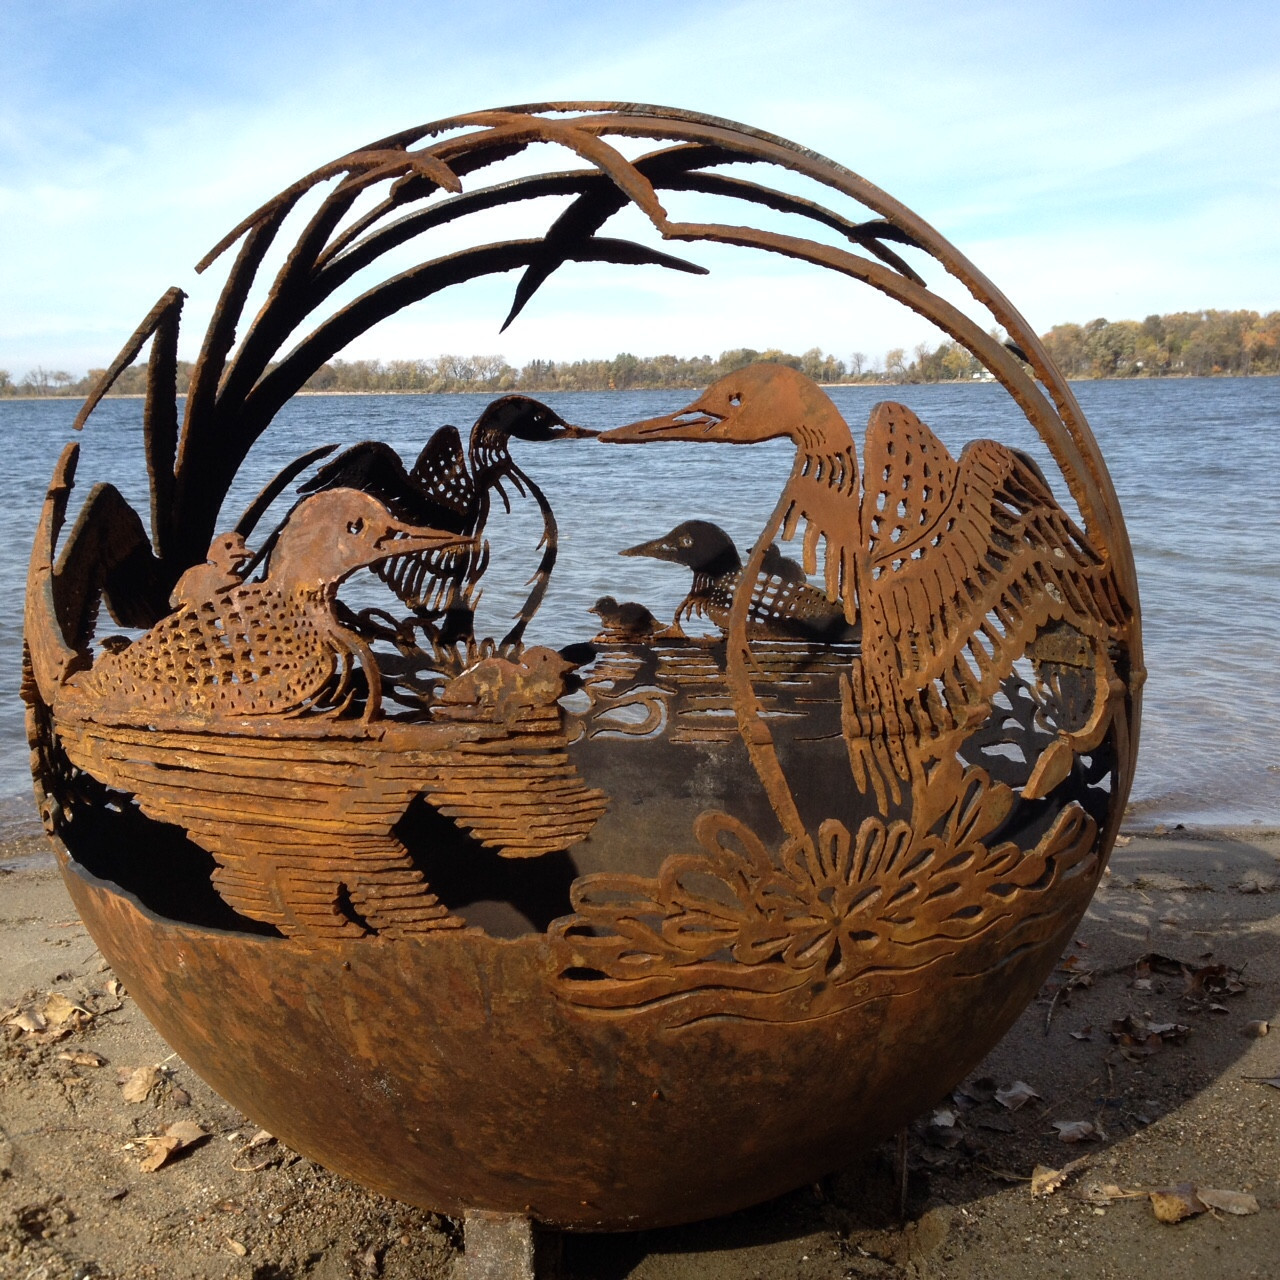 Beautiful Artistic Fire Pit Fireball Globes You Didn't ...